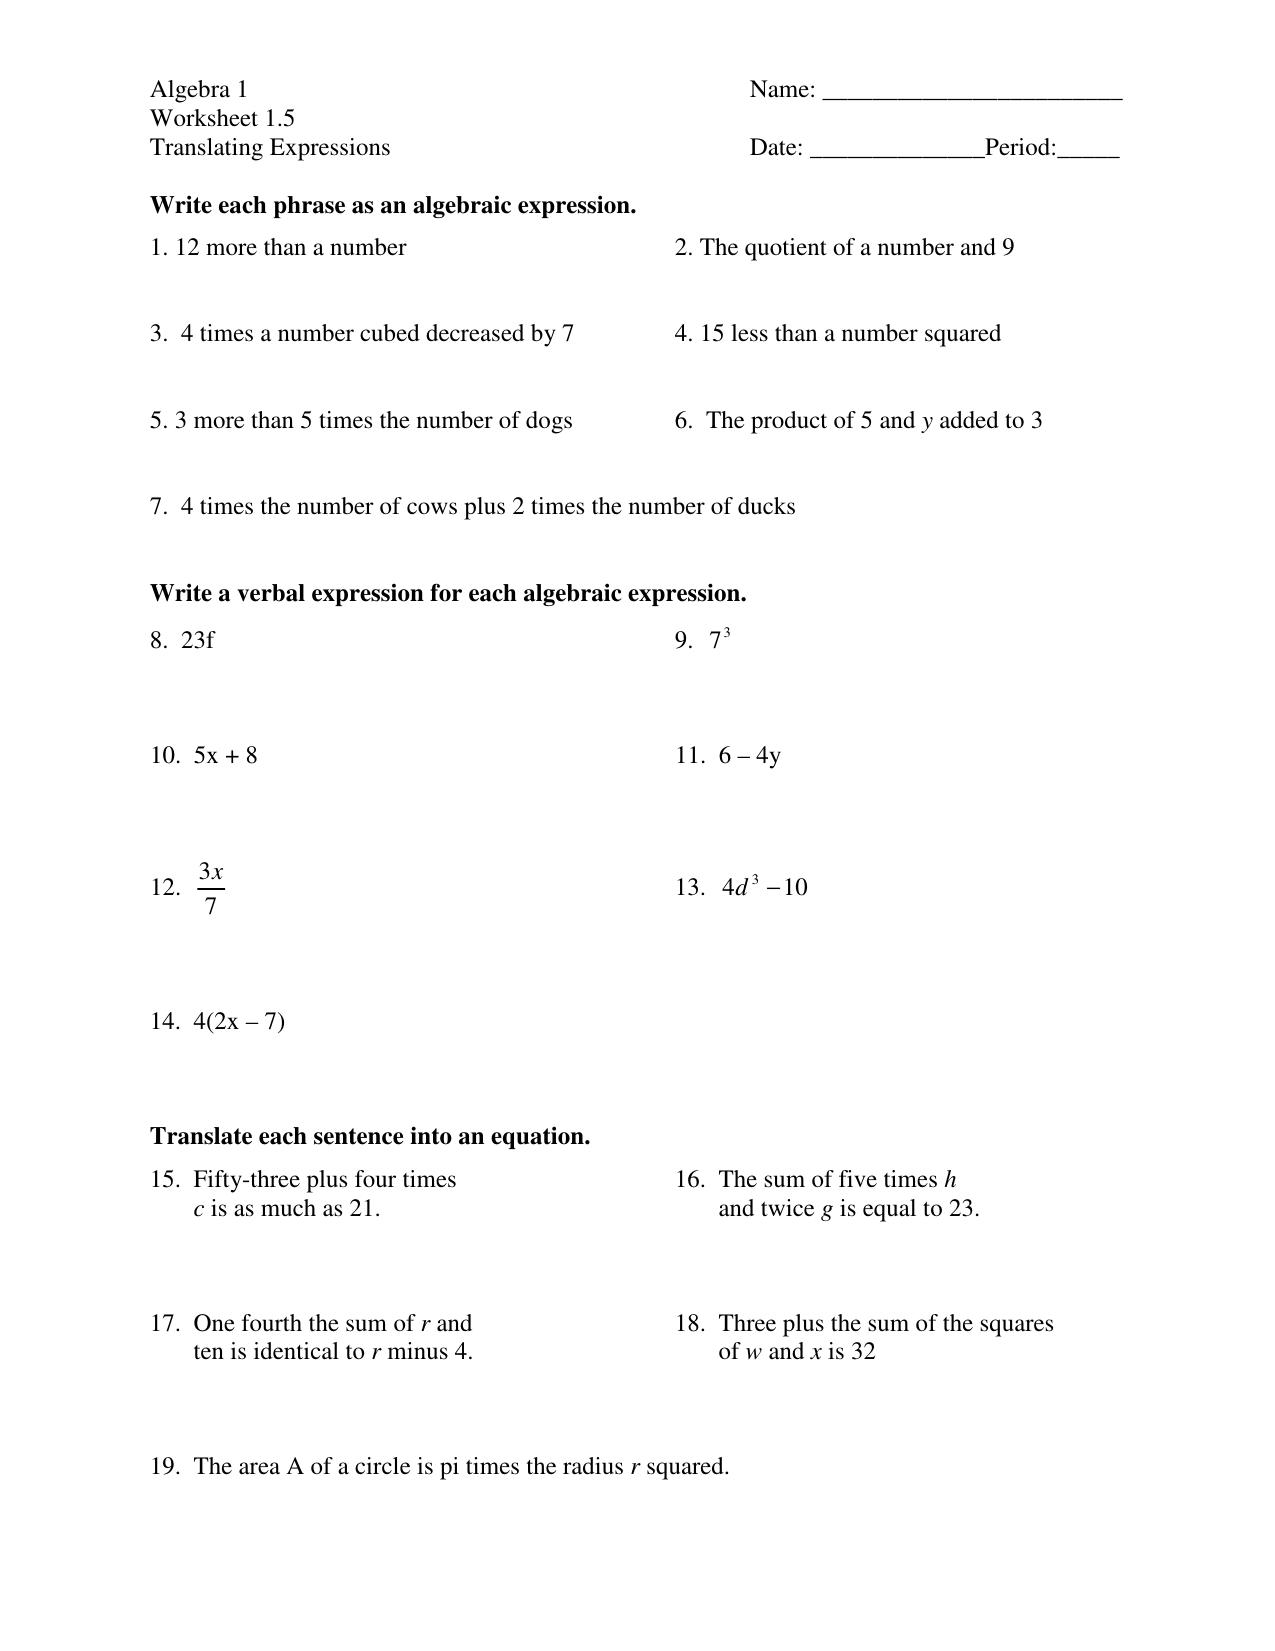 Algebra 1 Worksheet 15 Translating Expressions